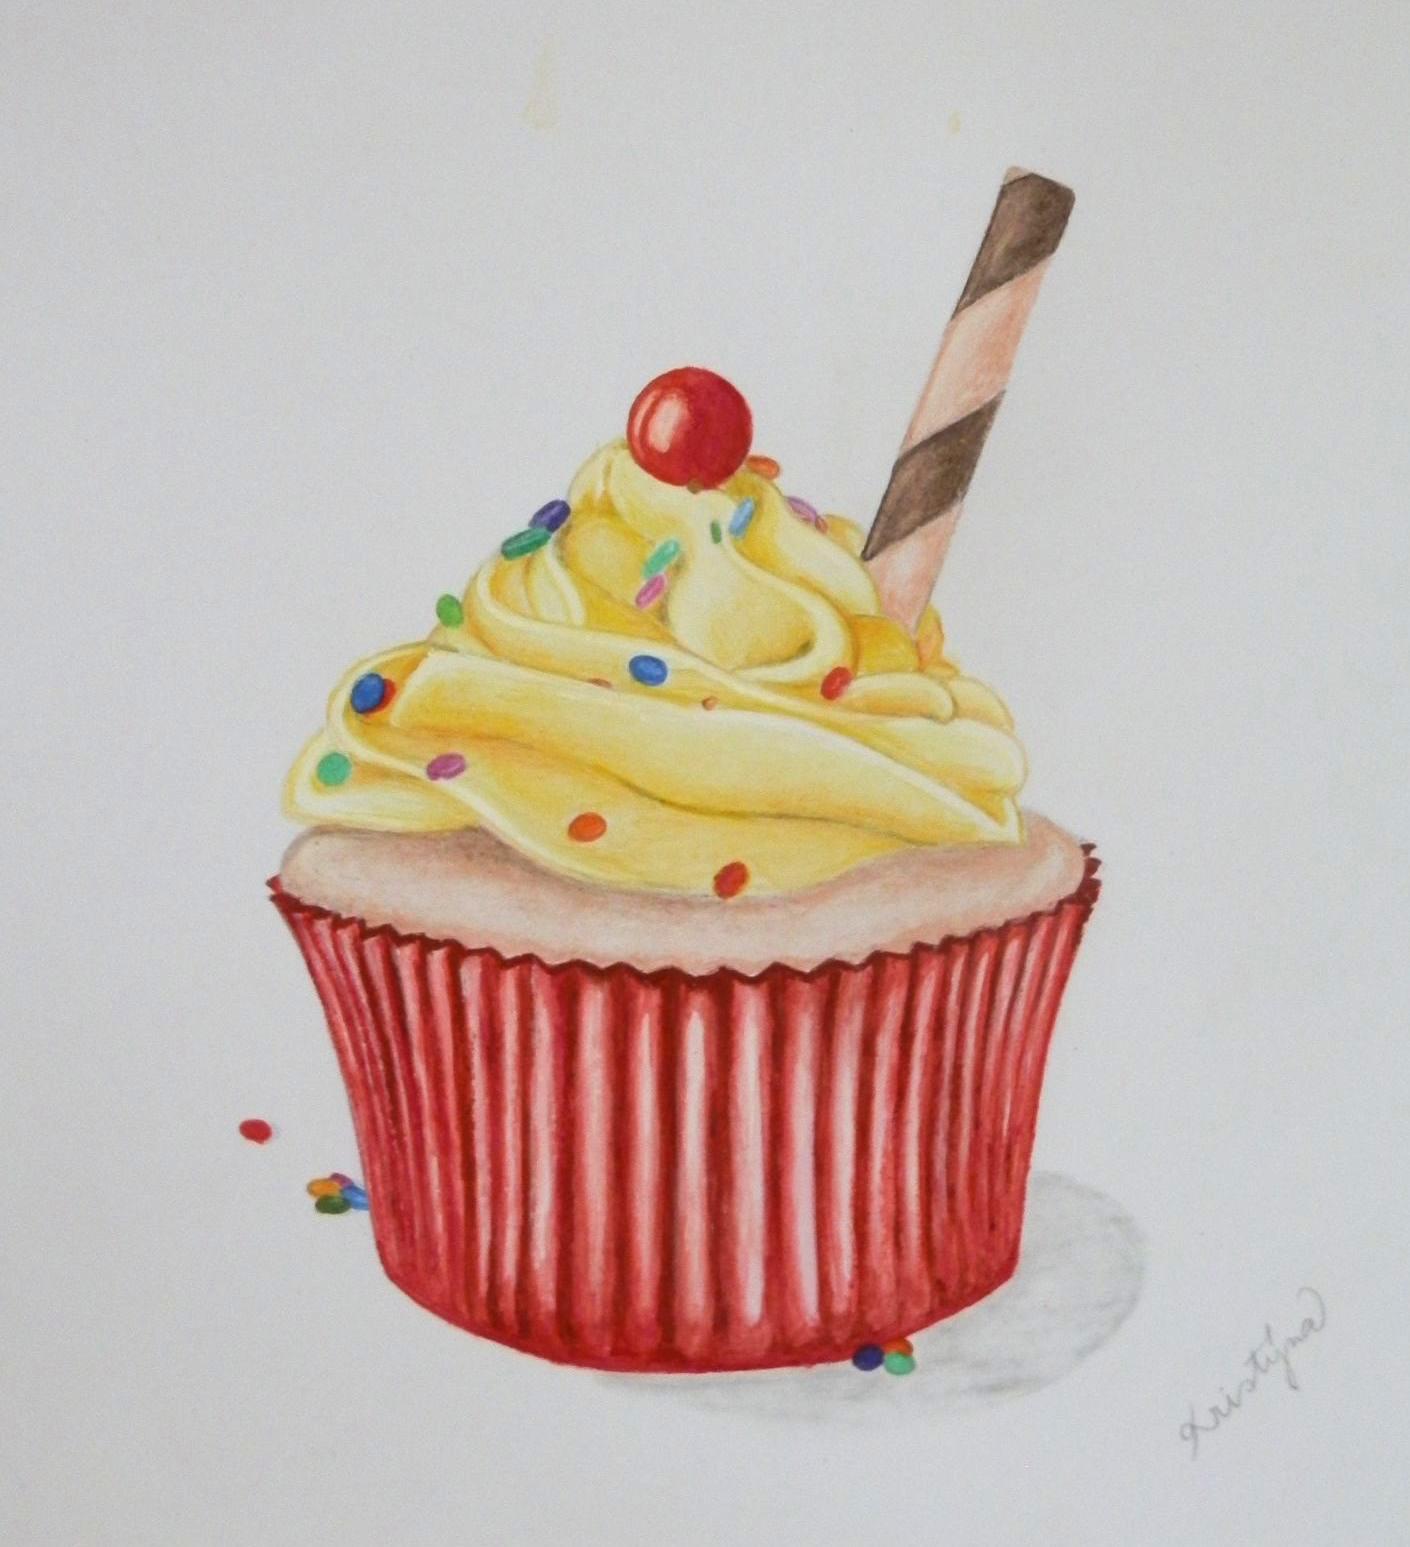 Cupcake No 2 Zbozi Prodejce Fea Fler Cz